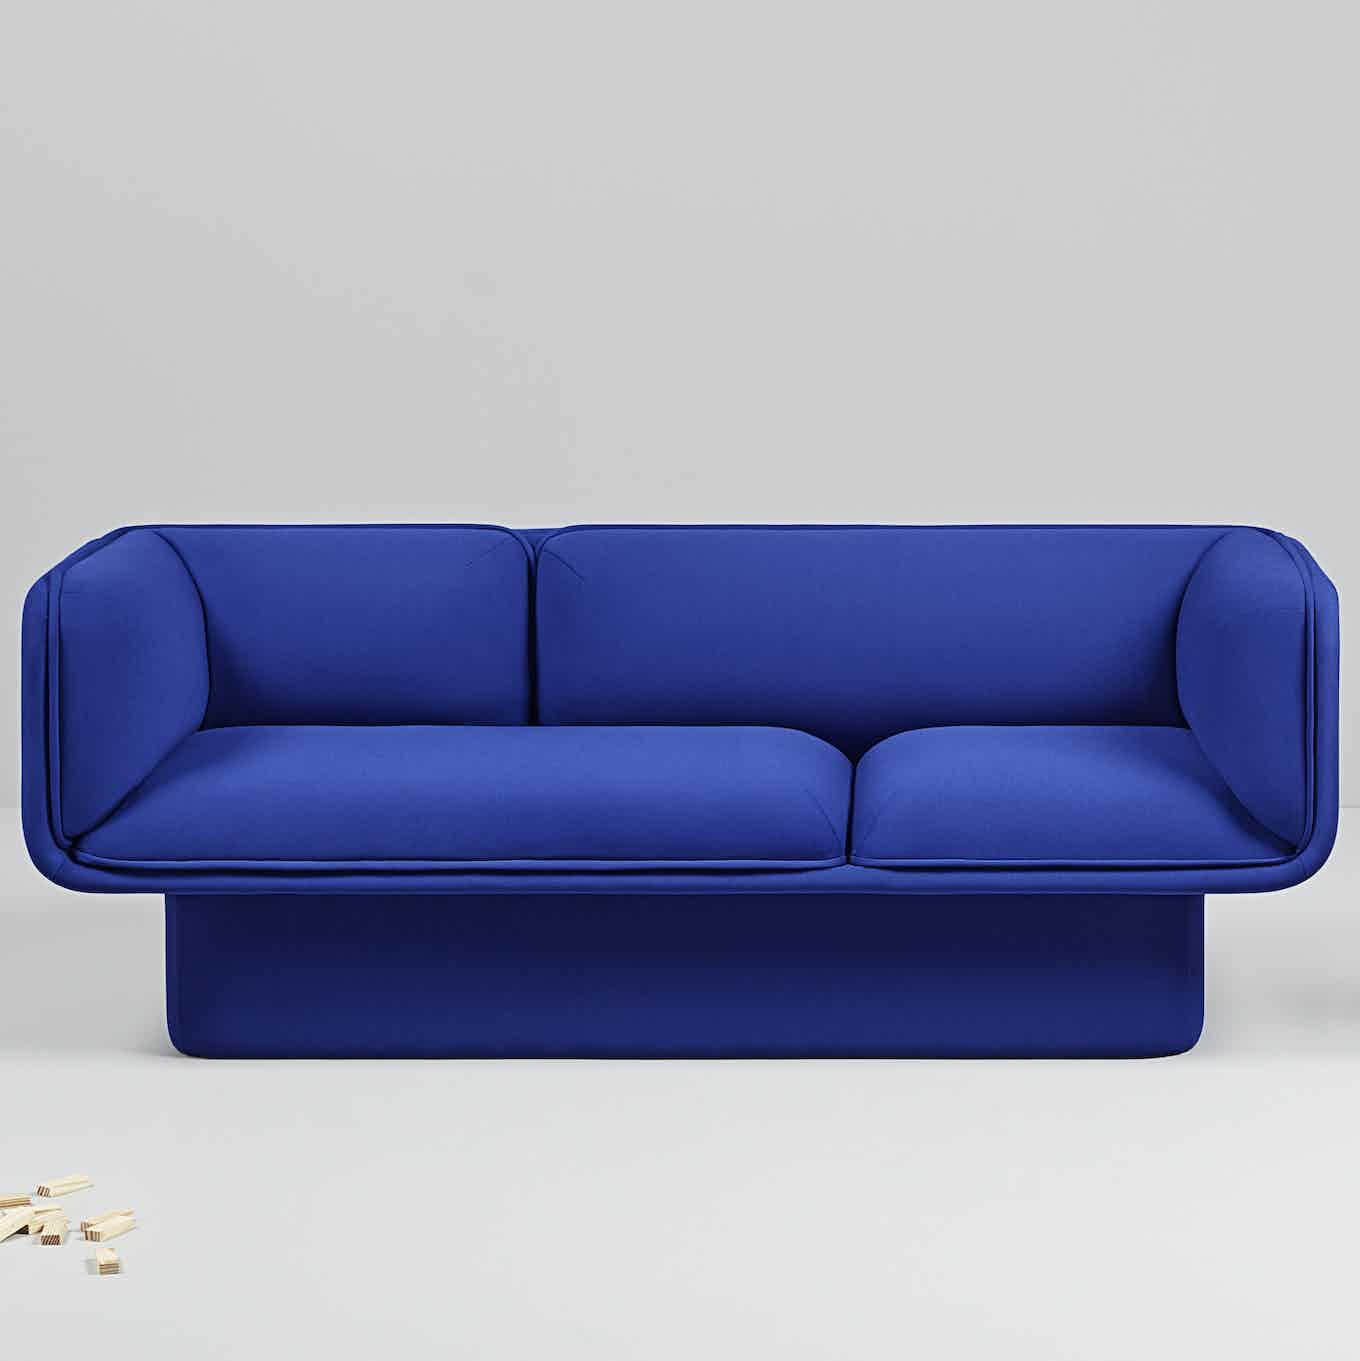 Missana-block-sofa-with-armchair-haute-living